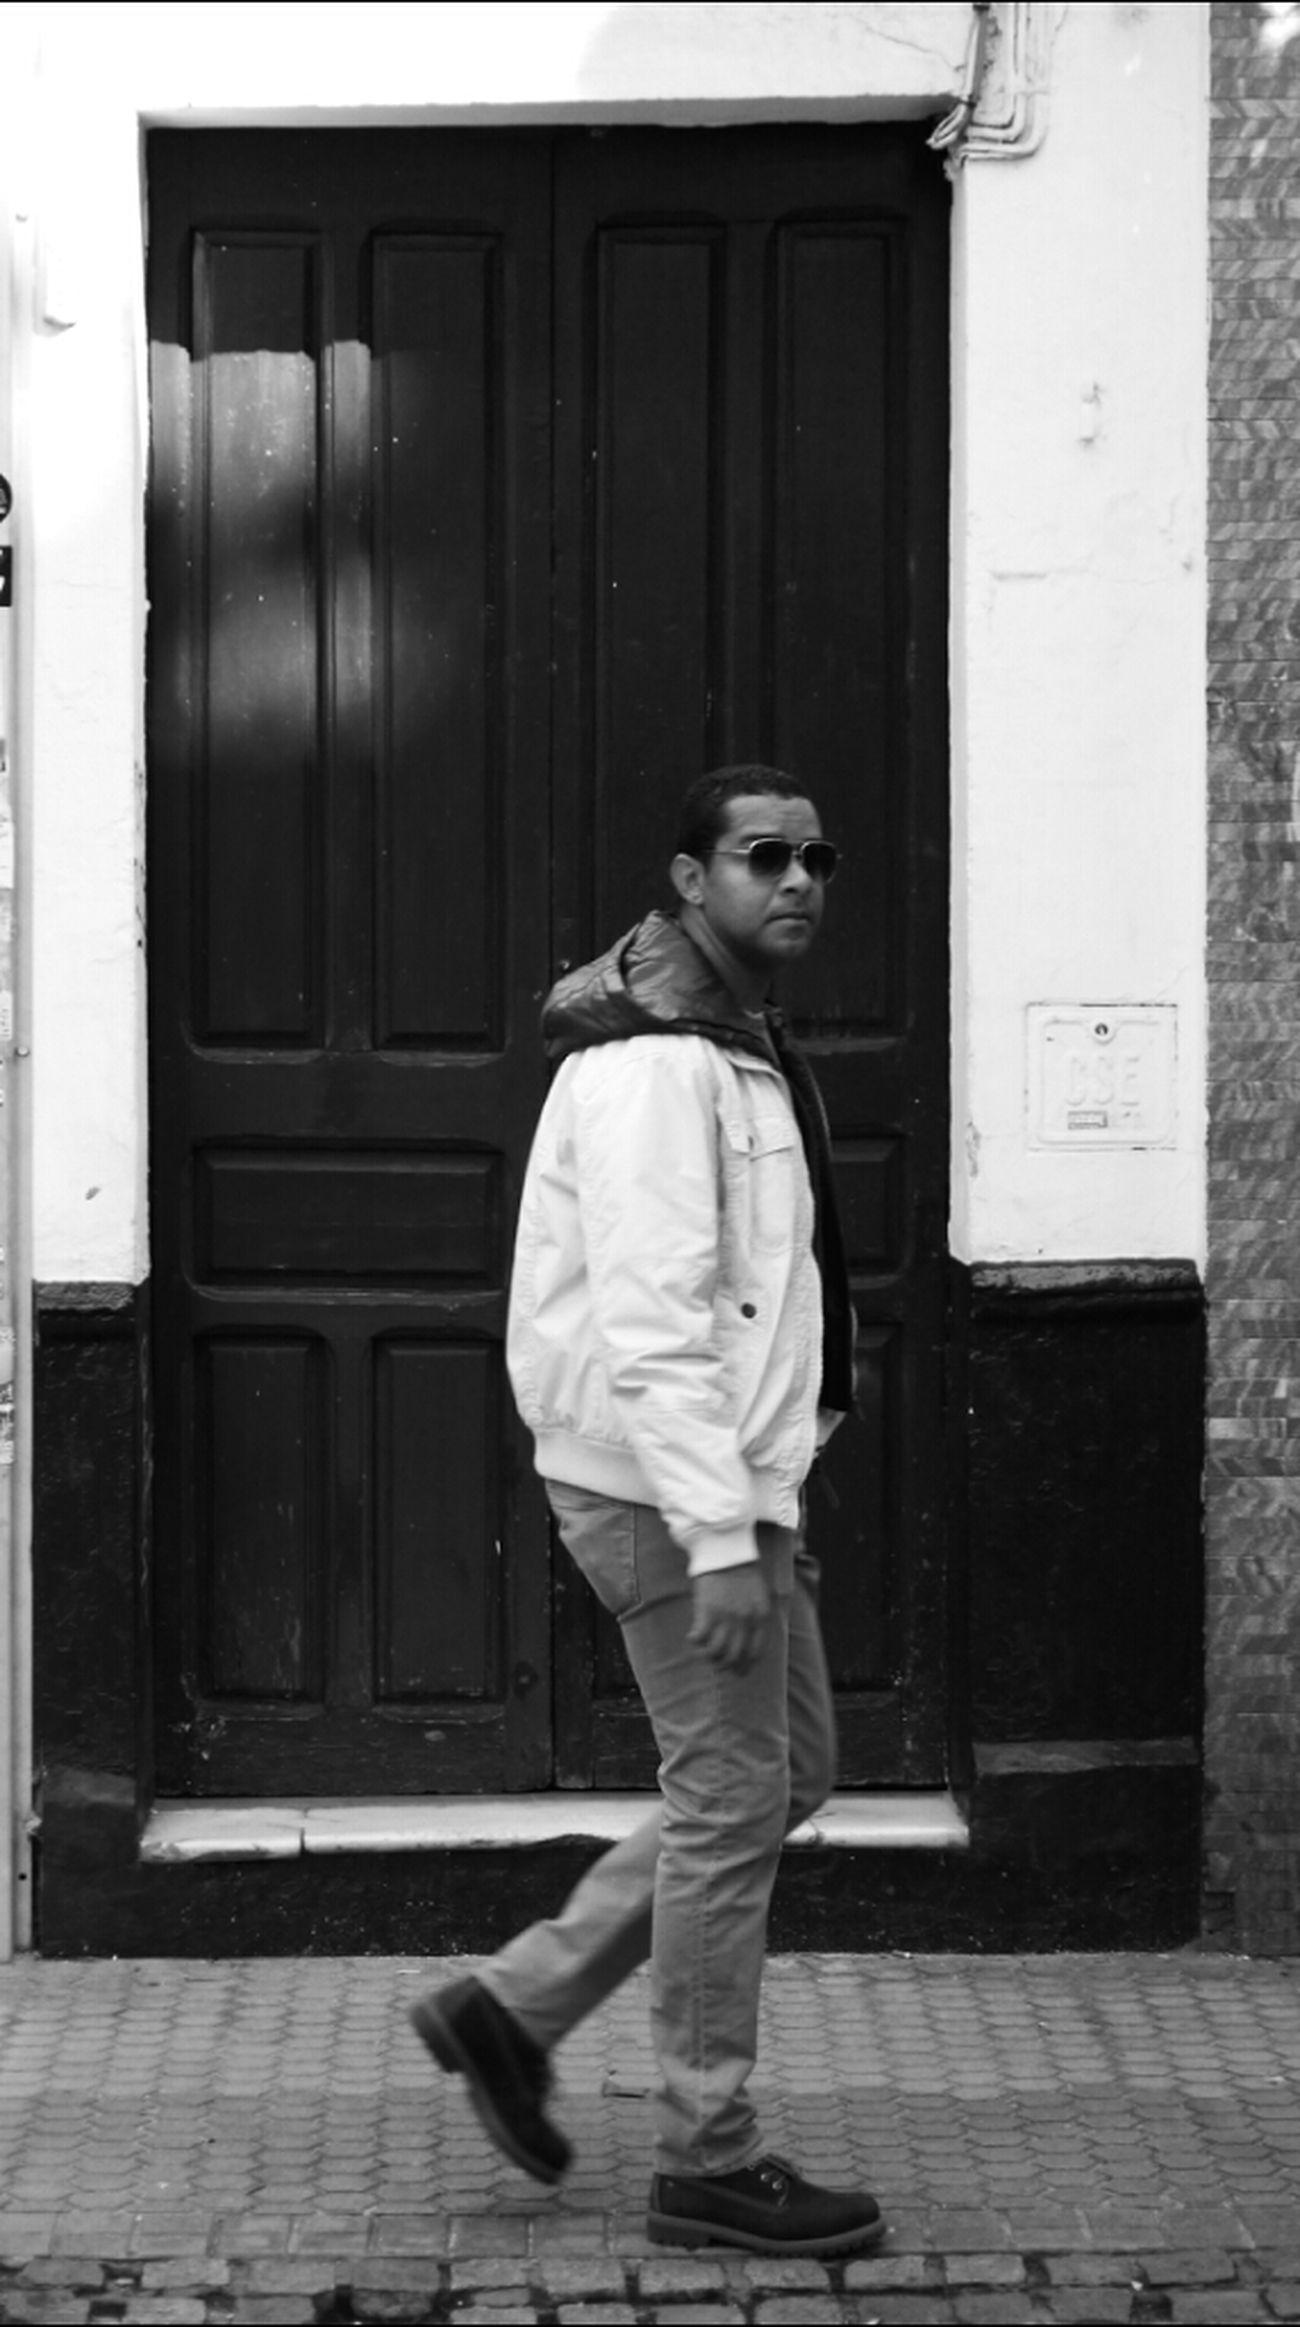 Blackandwhite Monochrome Streetphoto_bw Fortheloveofblackandwhite Bws_worldwide Italianbrother Bwstyles_gf Bws_artist_eu Peoplewalkingpastdoors